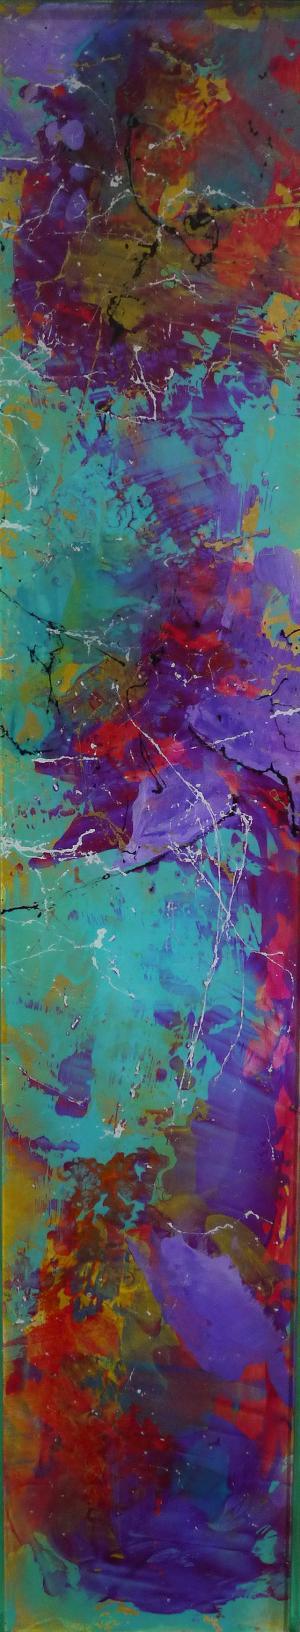 Purple Falls - Medium: Acrylic on Acrylic, Size: 32.5x6.5, Availability: Sold